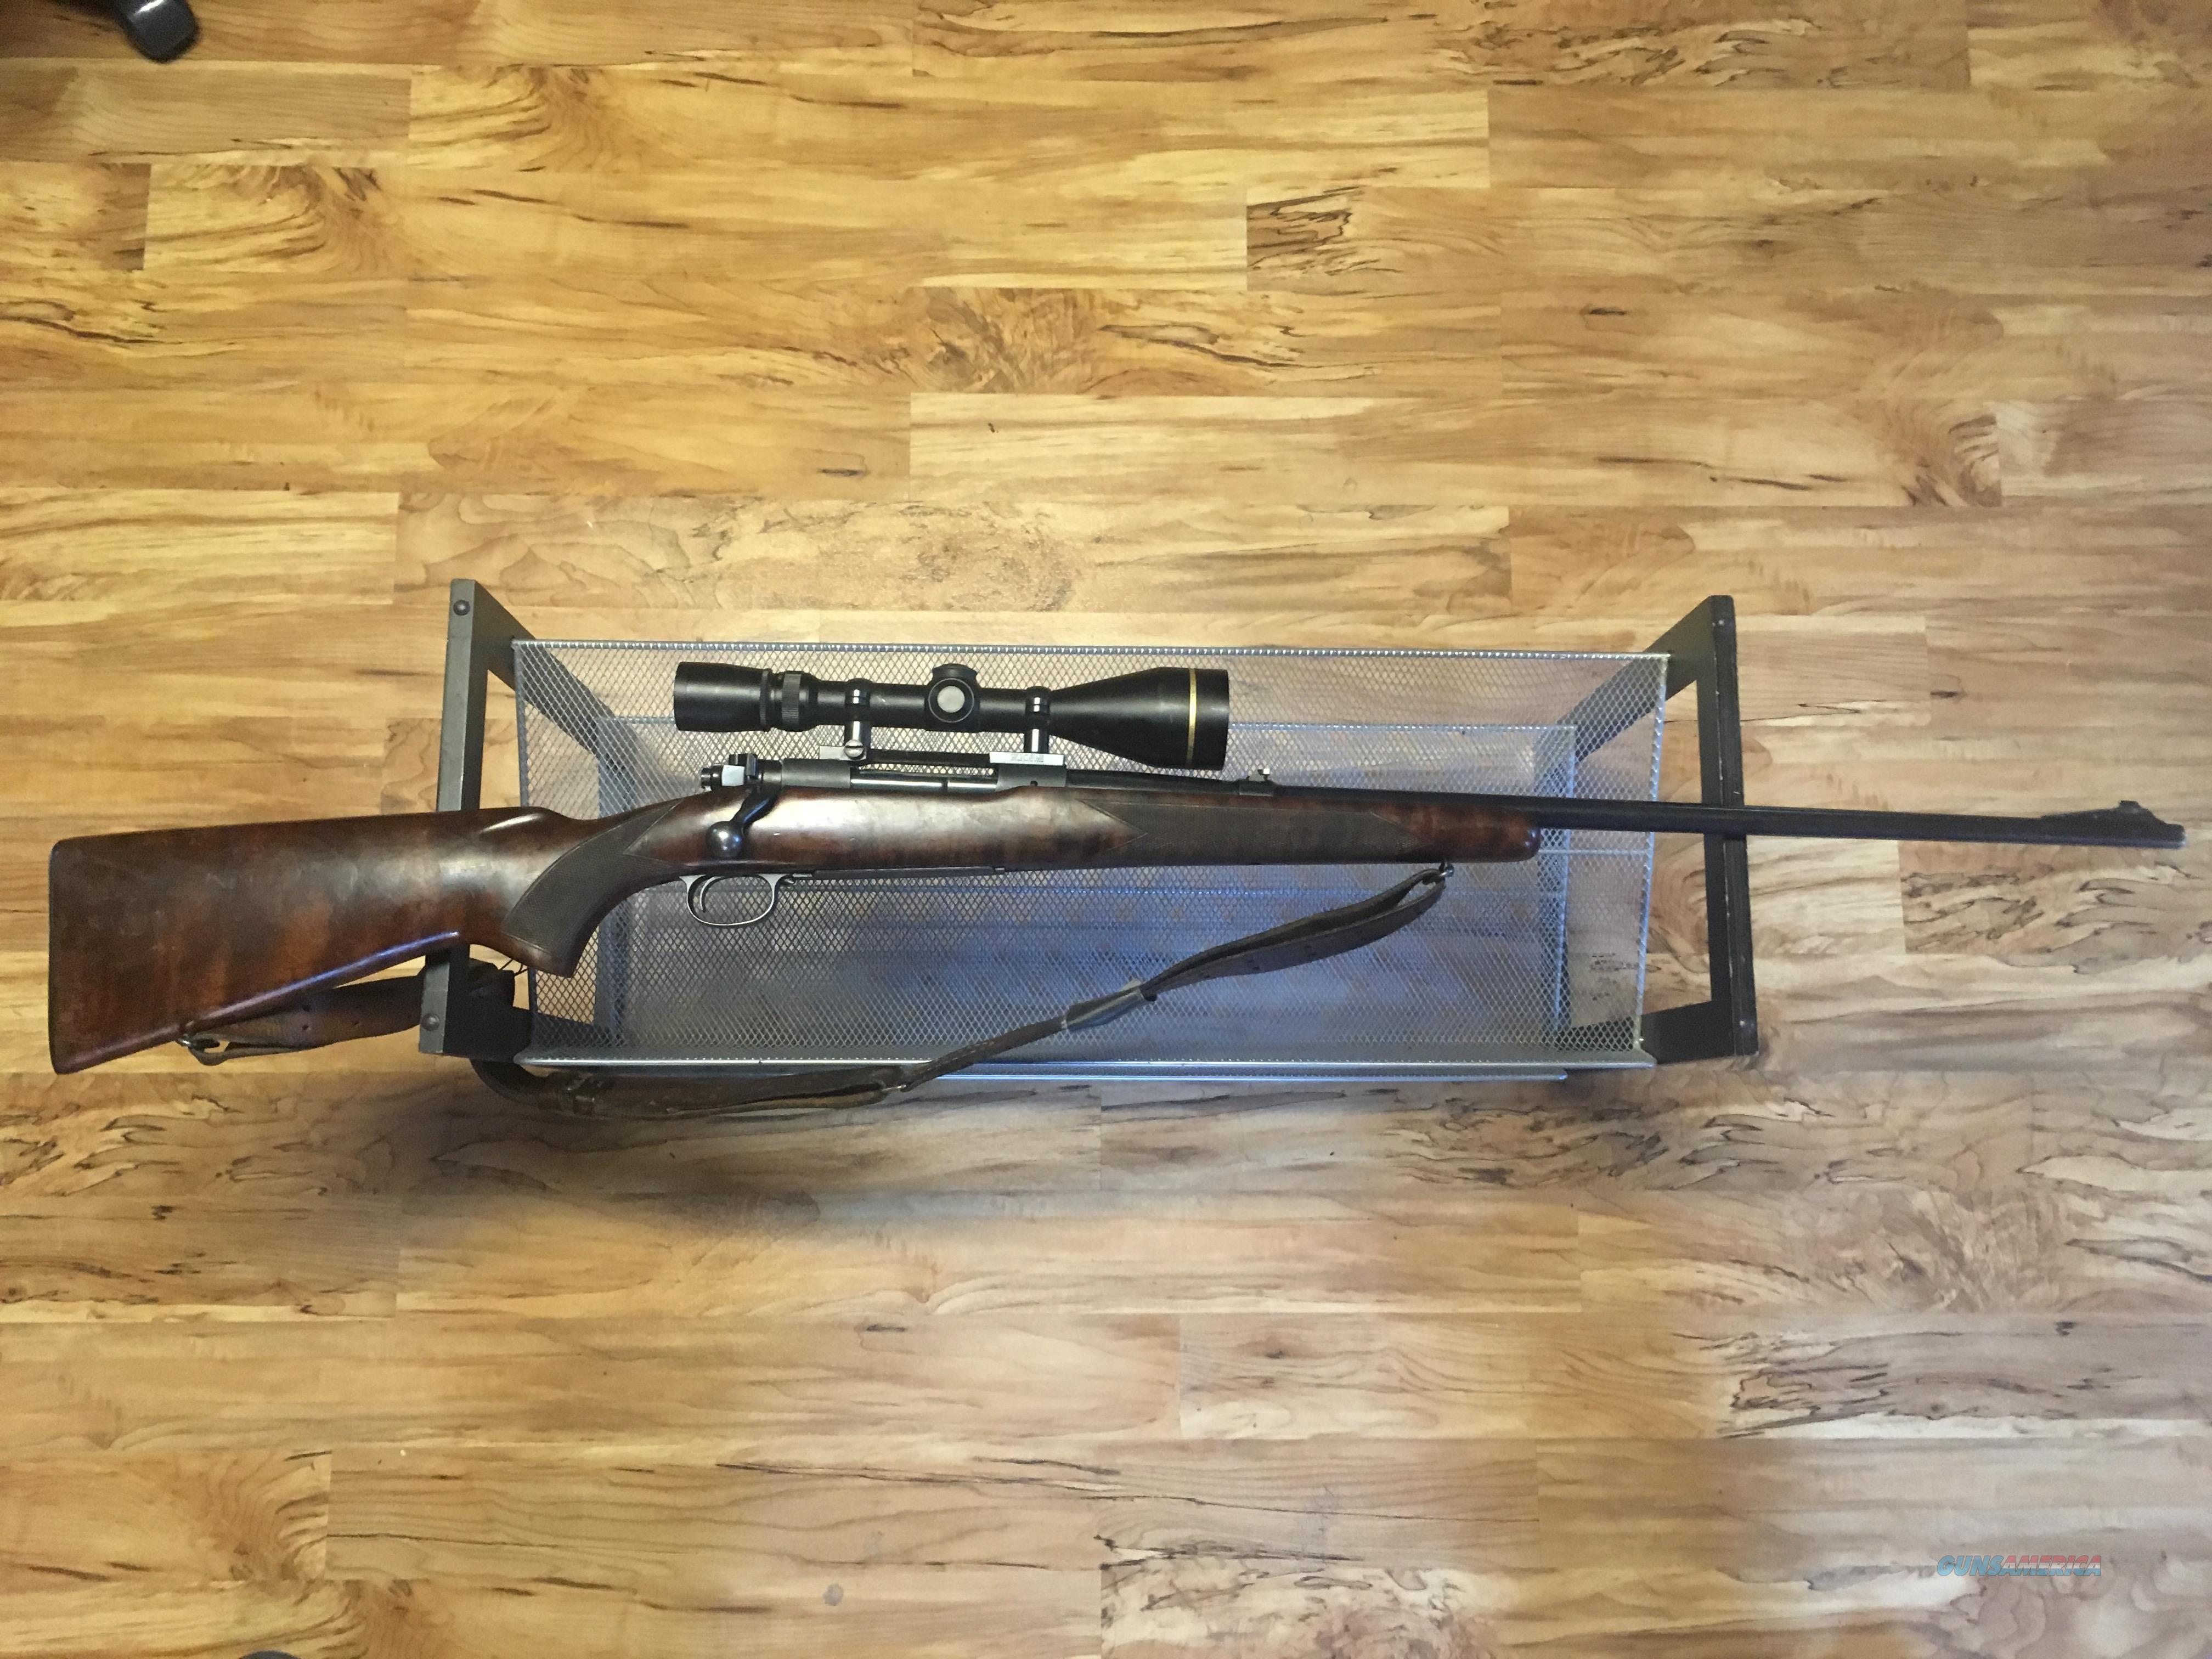 Pre-64 Winchester Model 70 Bolt Action Rifle in 300 H&H Magnum  Guns > Rifles > Winchester Rifles - Modern Bolt/Auto/Single > Model 70 > Pre-64